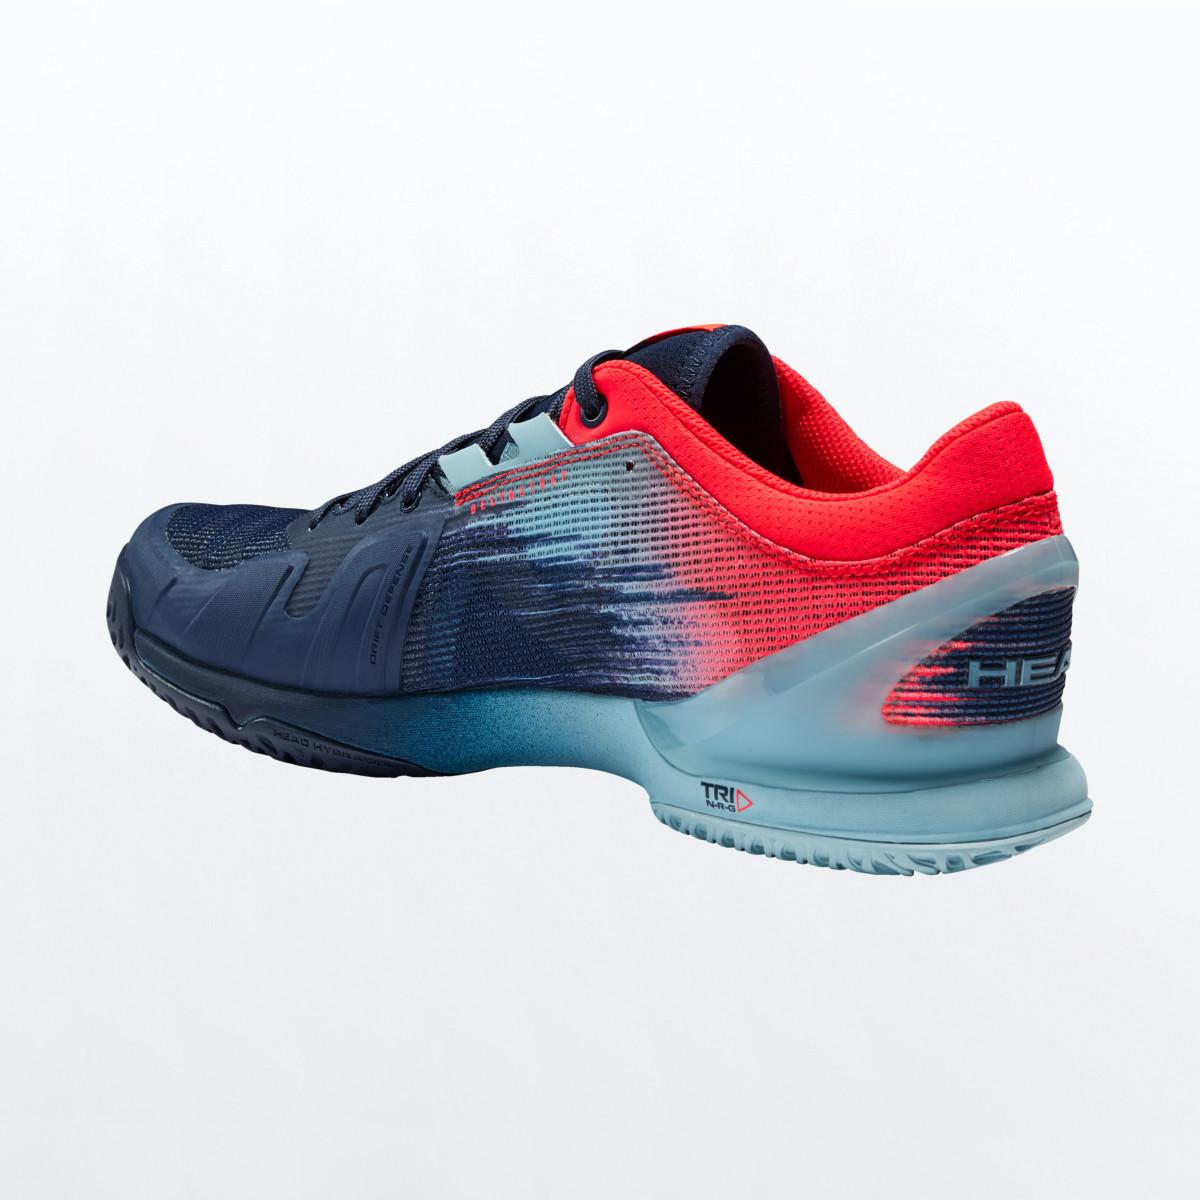 Head Sprint Pro 3.0 Mens Tennis Shoes – Dress Blue/Neon Red